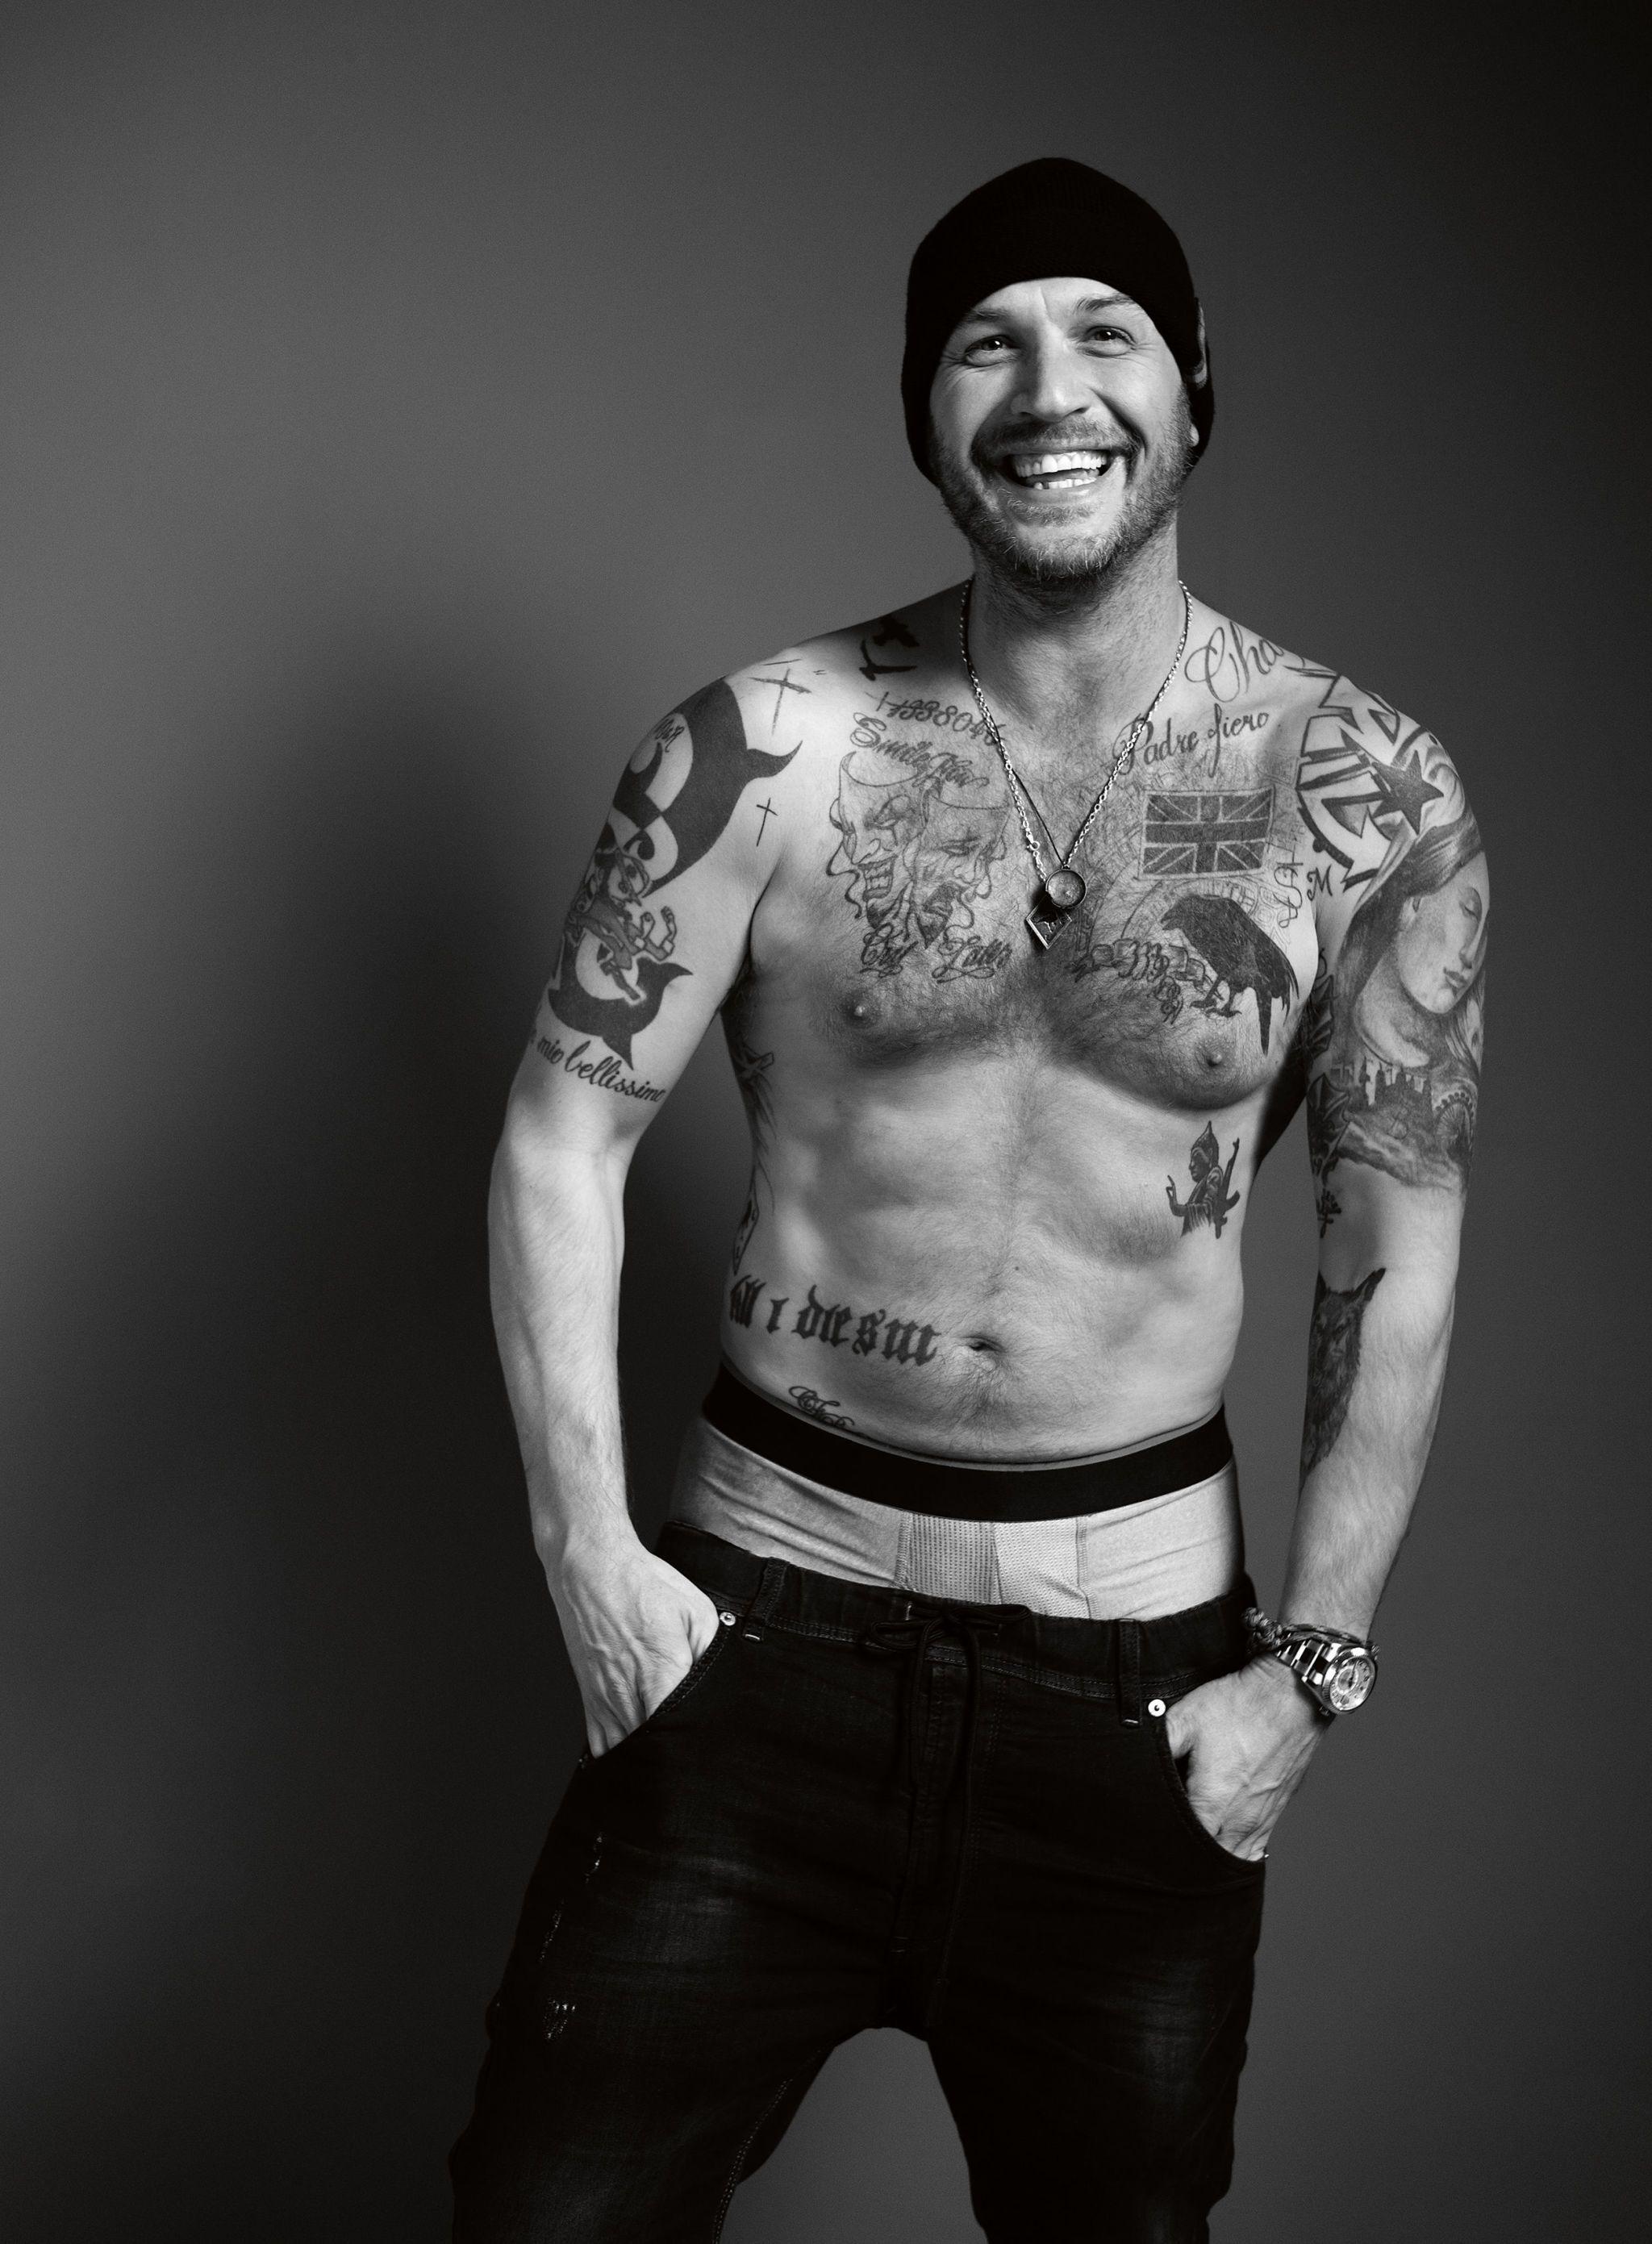 German MILF Tattoo Artist Interview